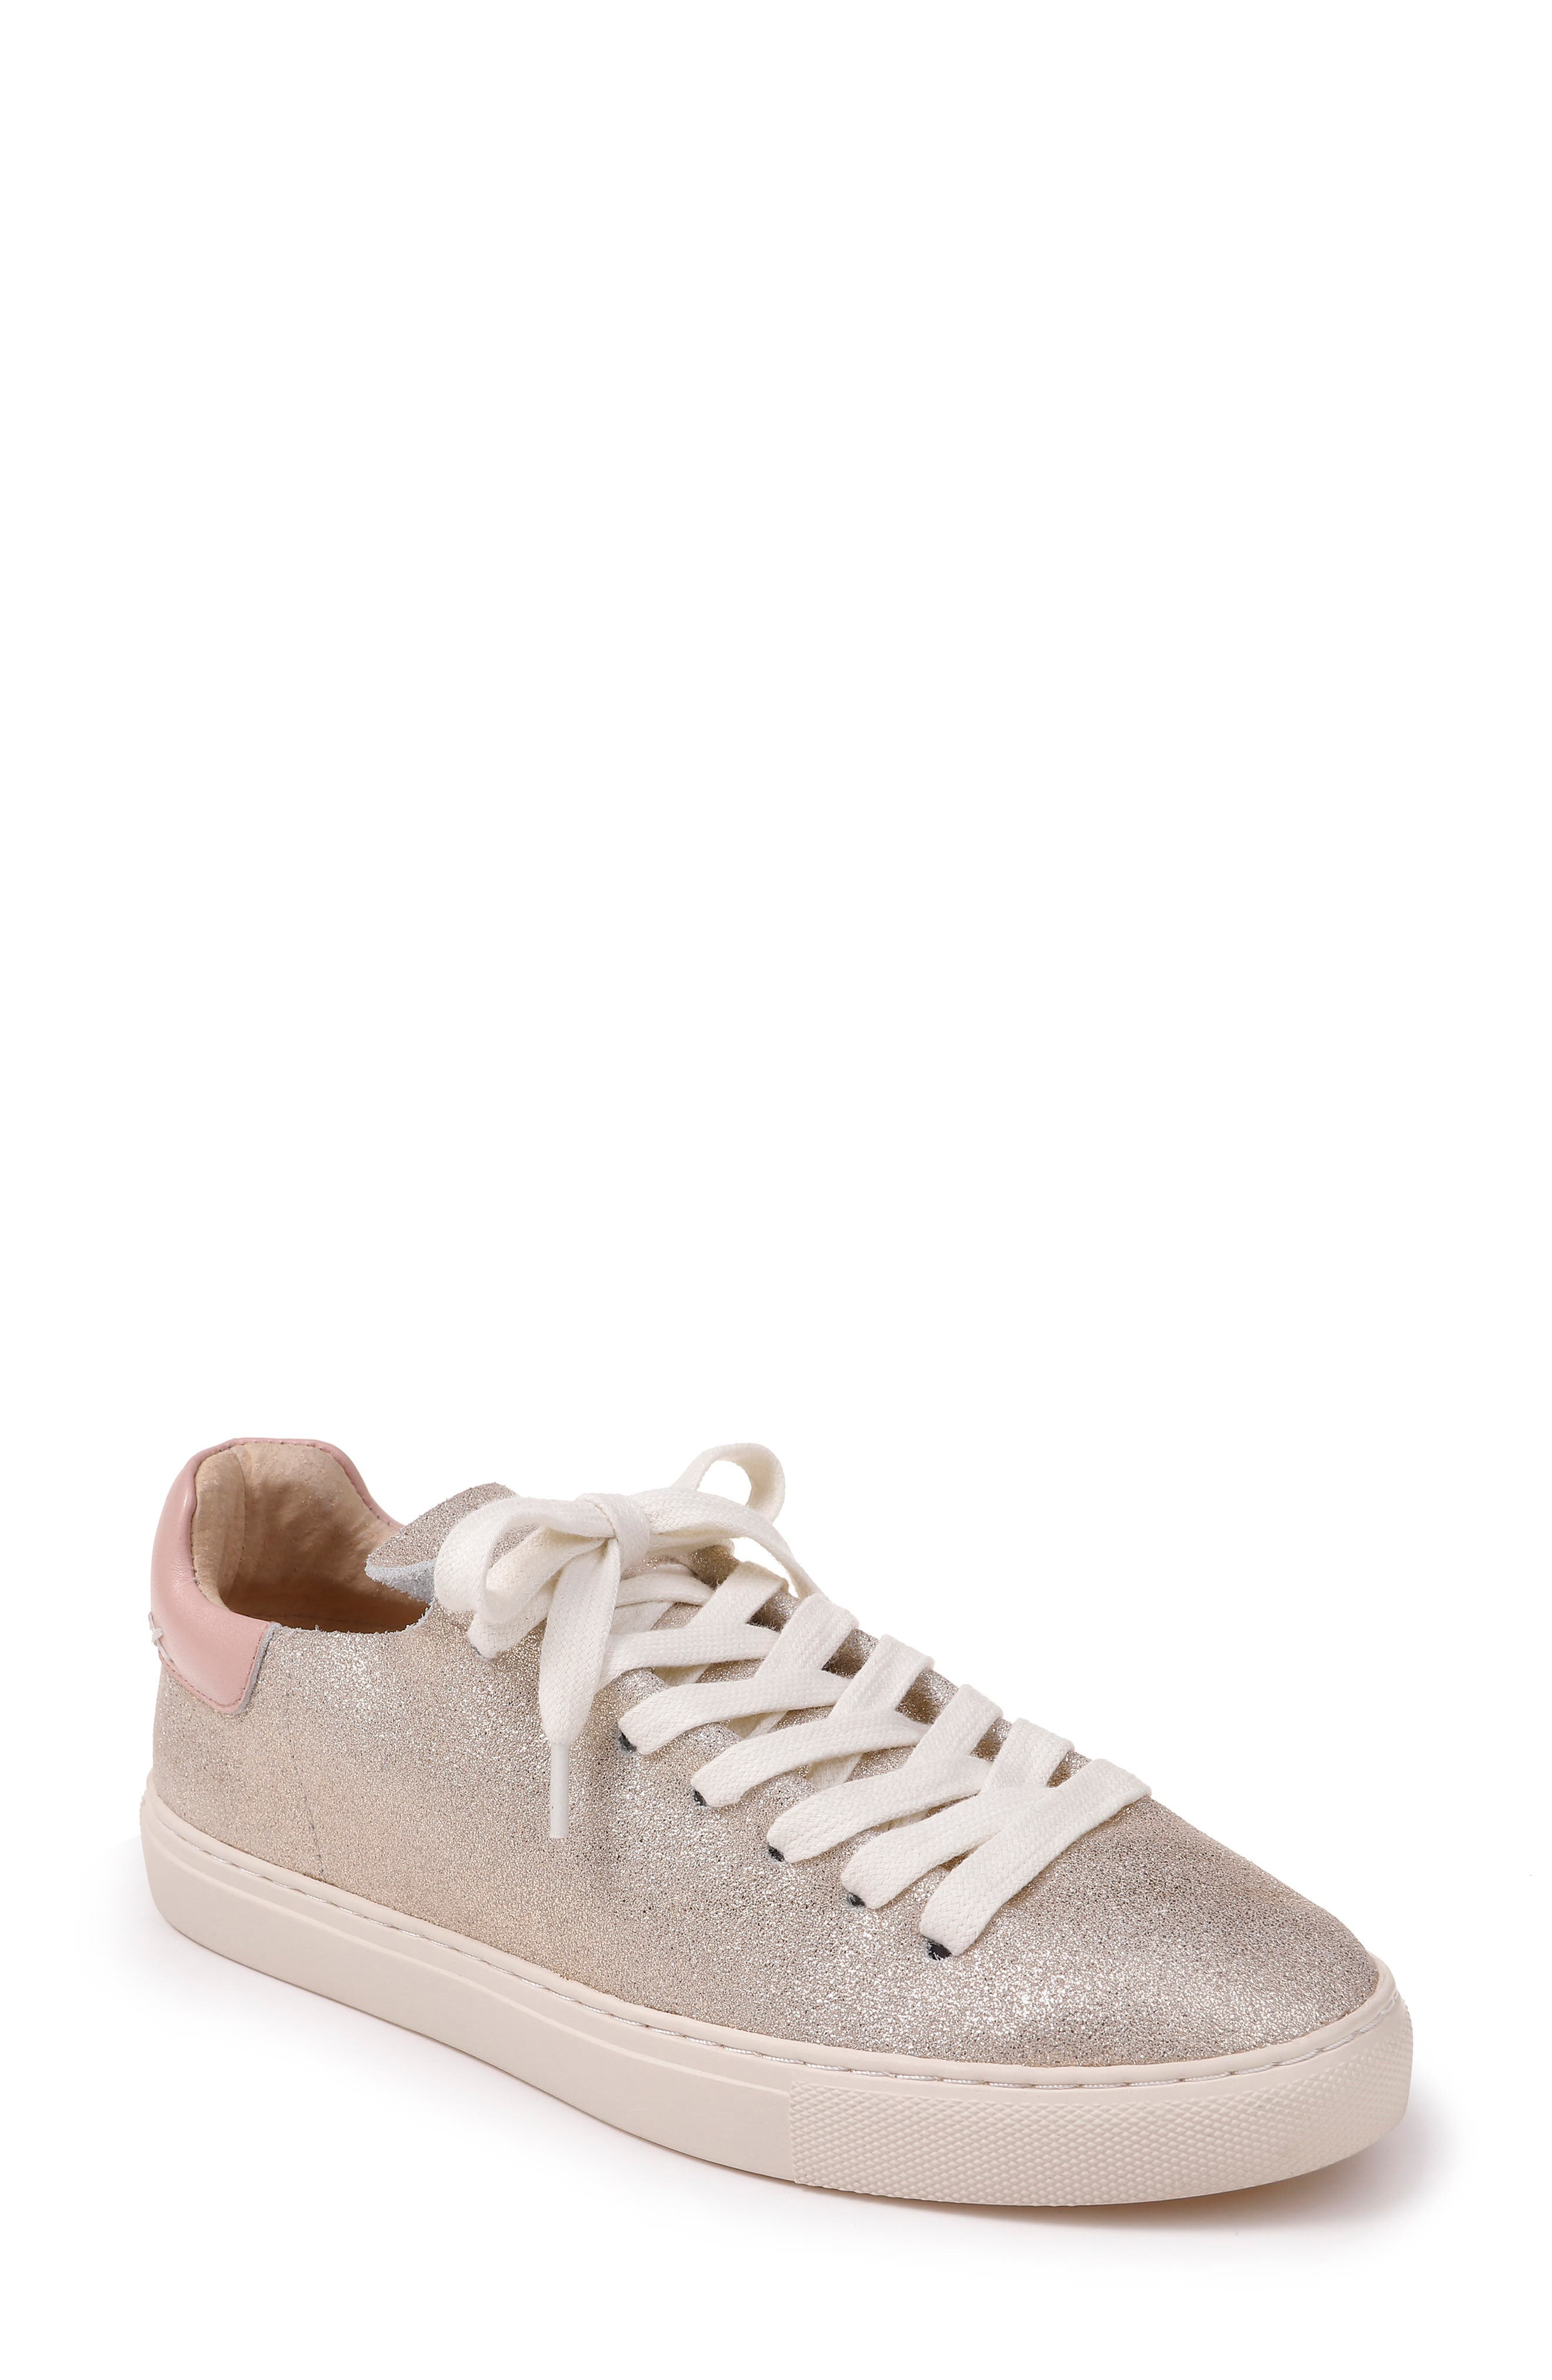 Splendid Hickort Sneaker, Beige